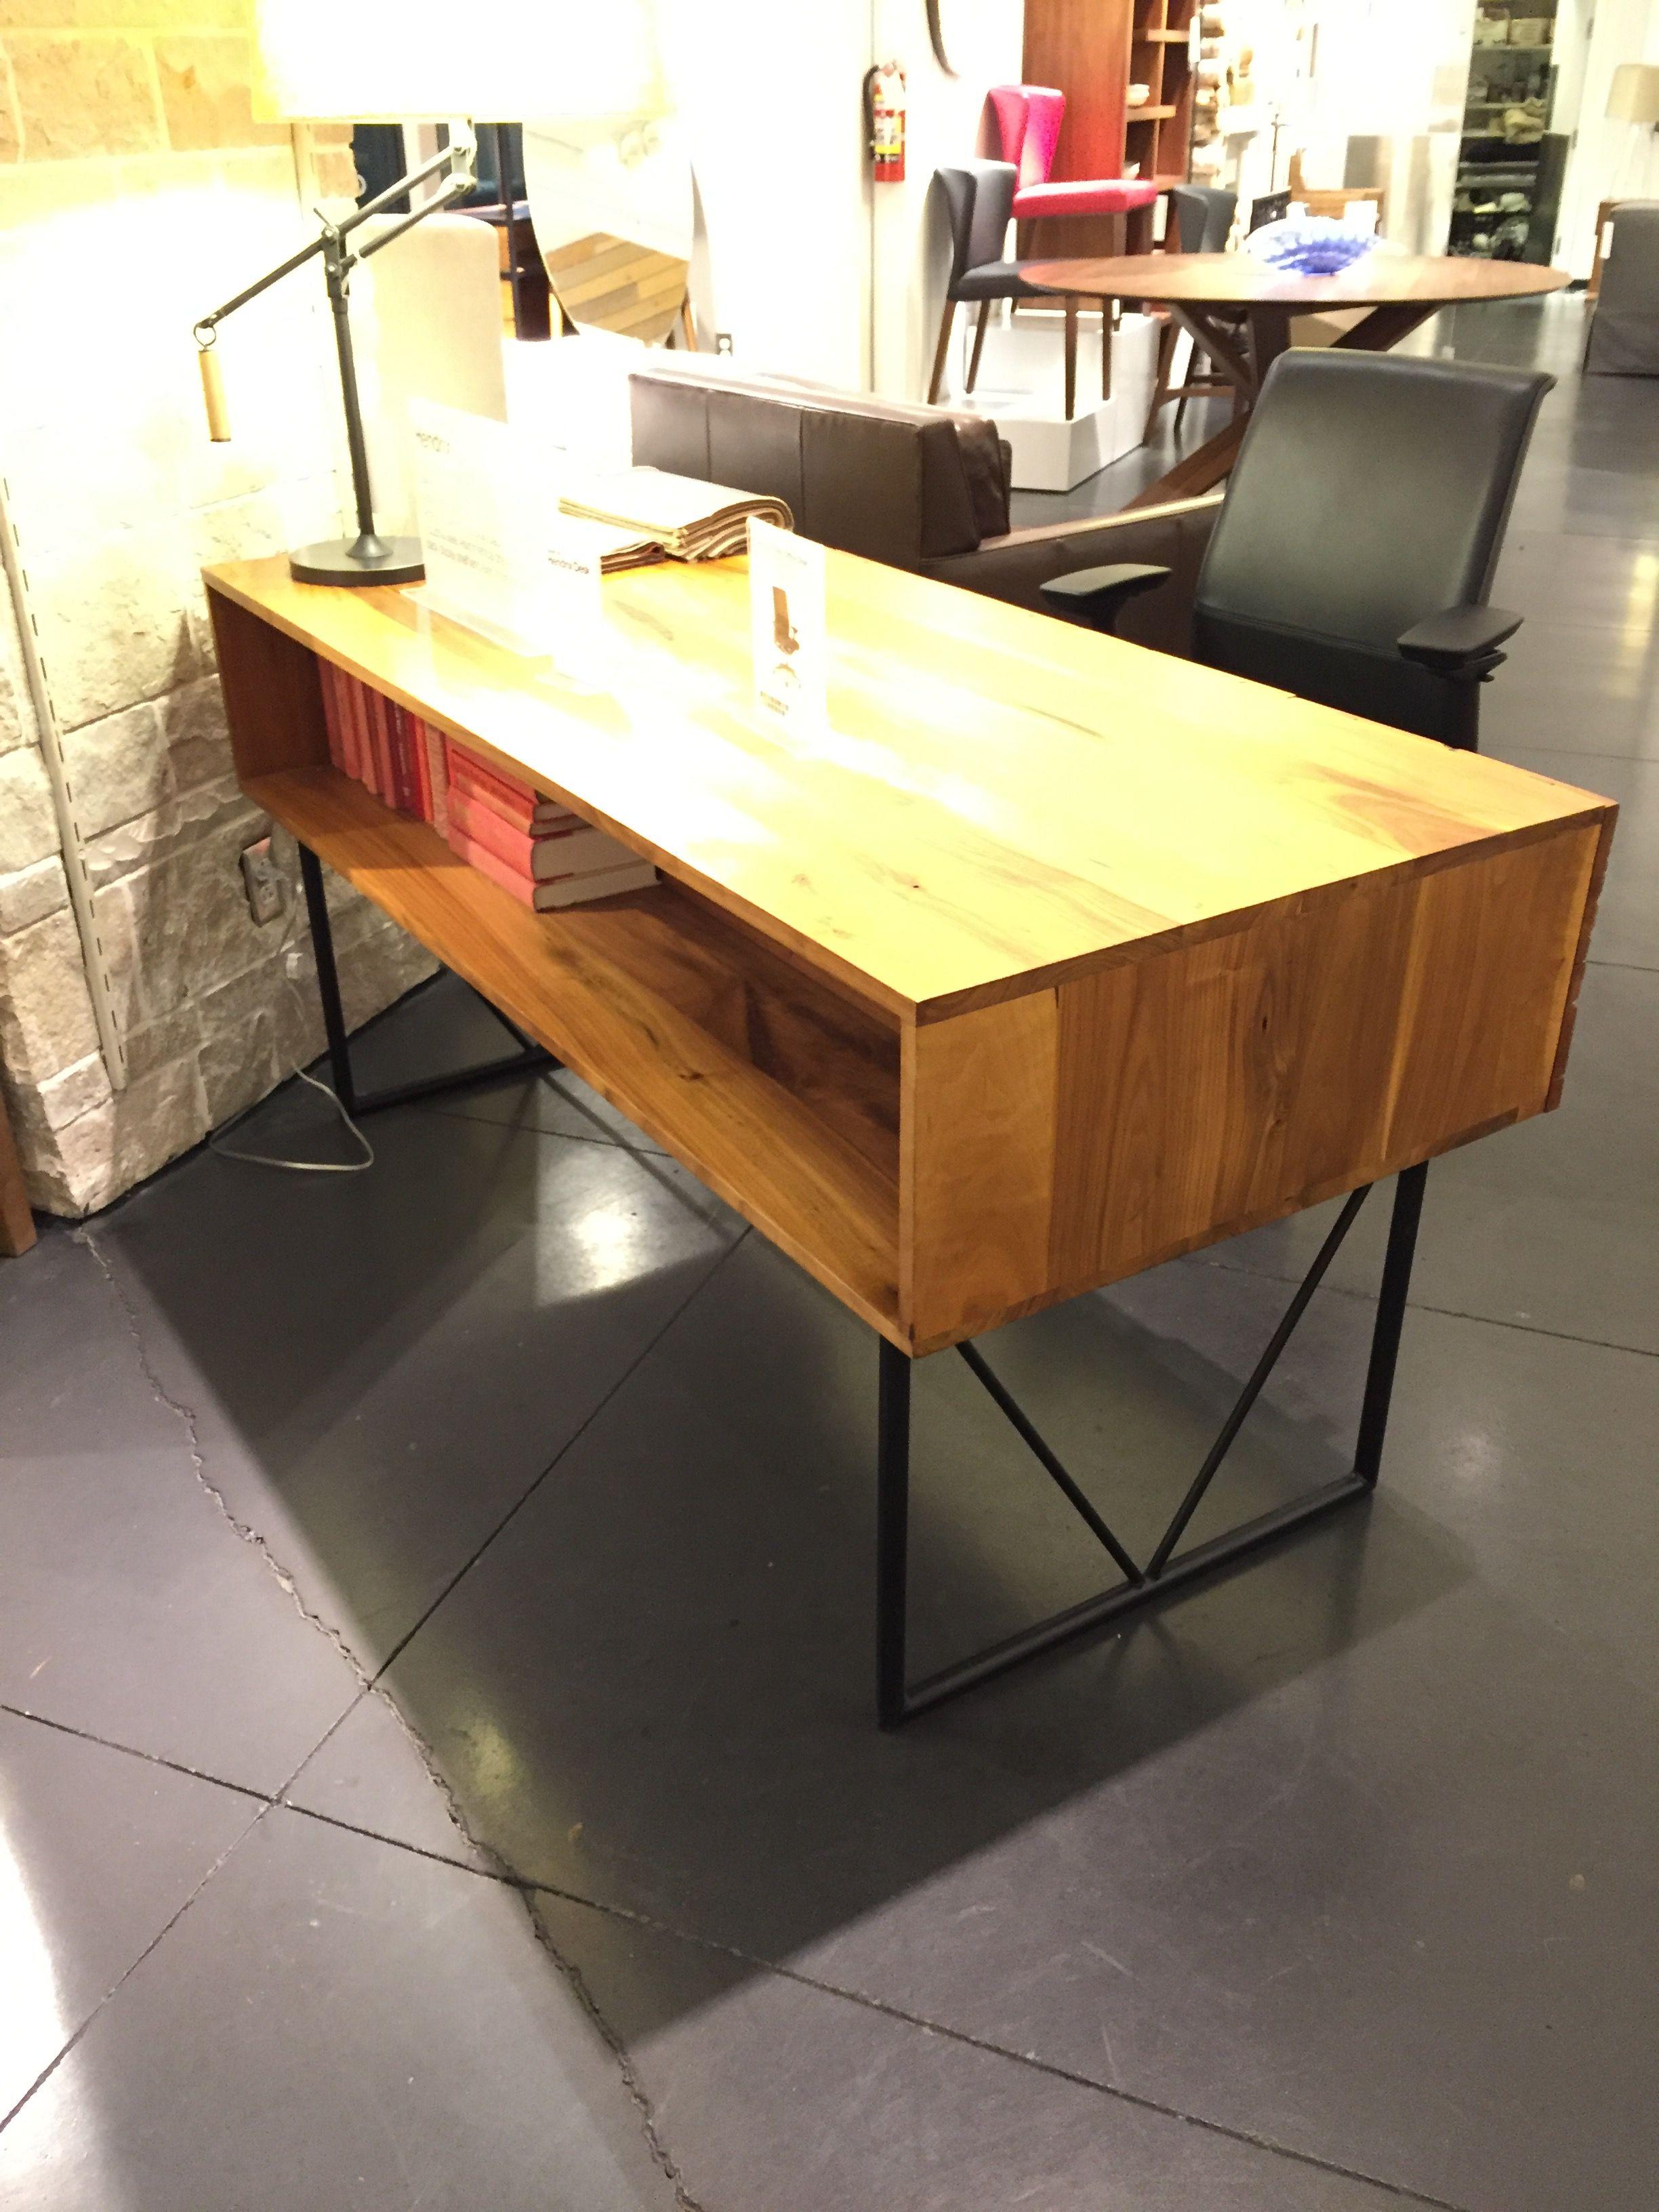 1600 Crate Barrel Hendrix Desk Drawers Front Shelf Back 63w X 28 3 4d X 30 1 2h Desk With Drawers Desk Drawer Fronts